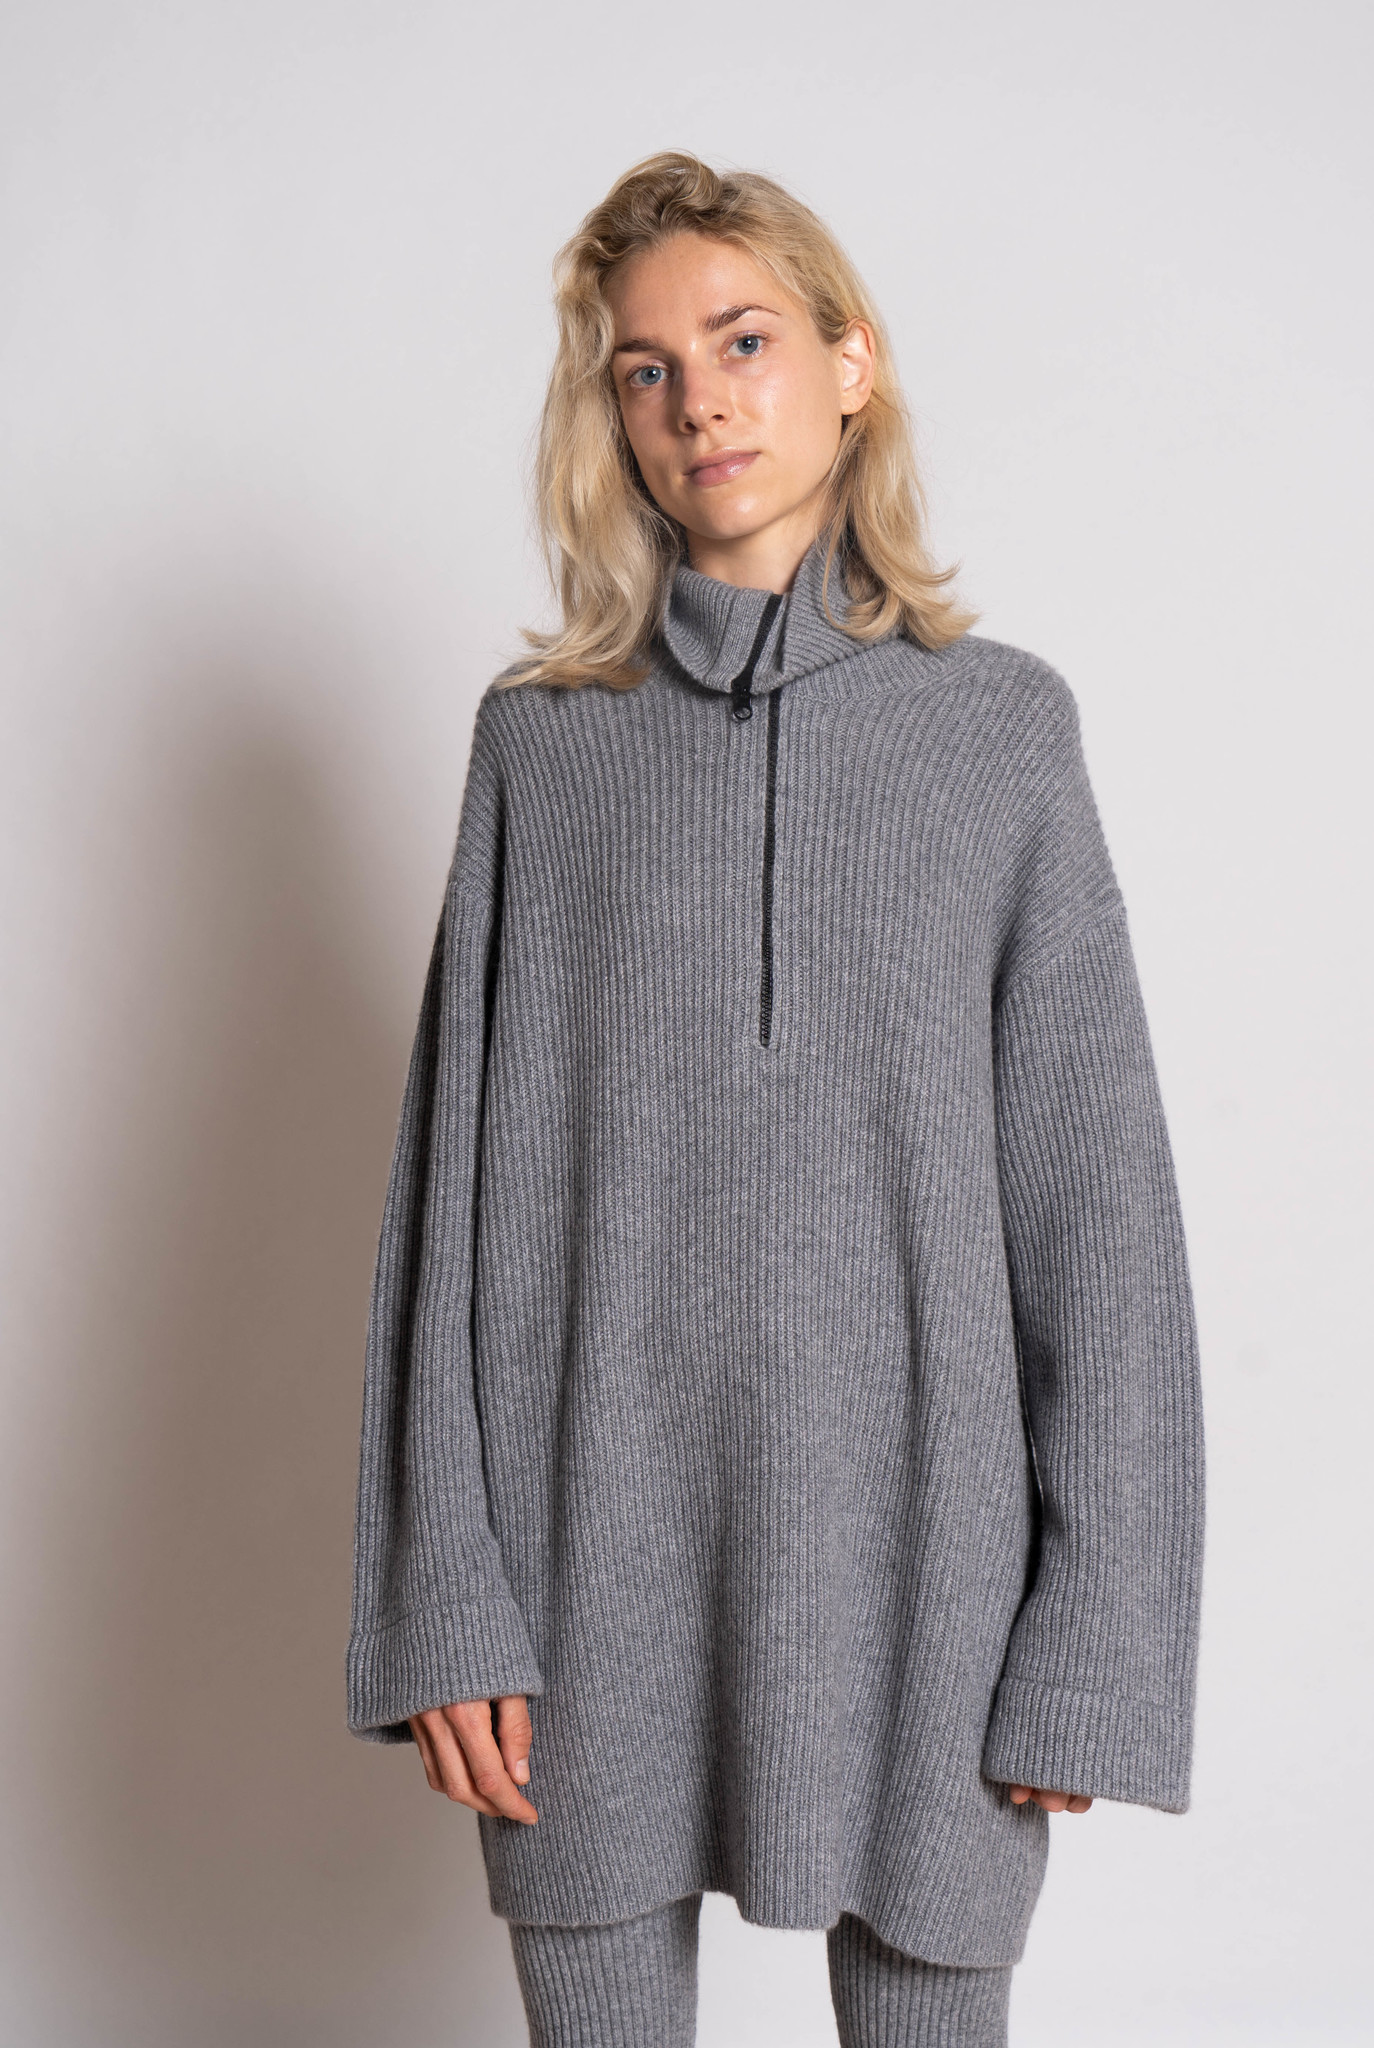 Aubree Sweater Grey